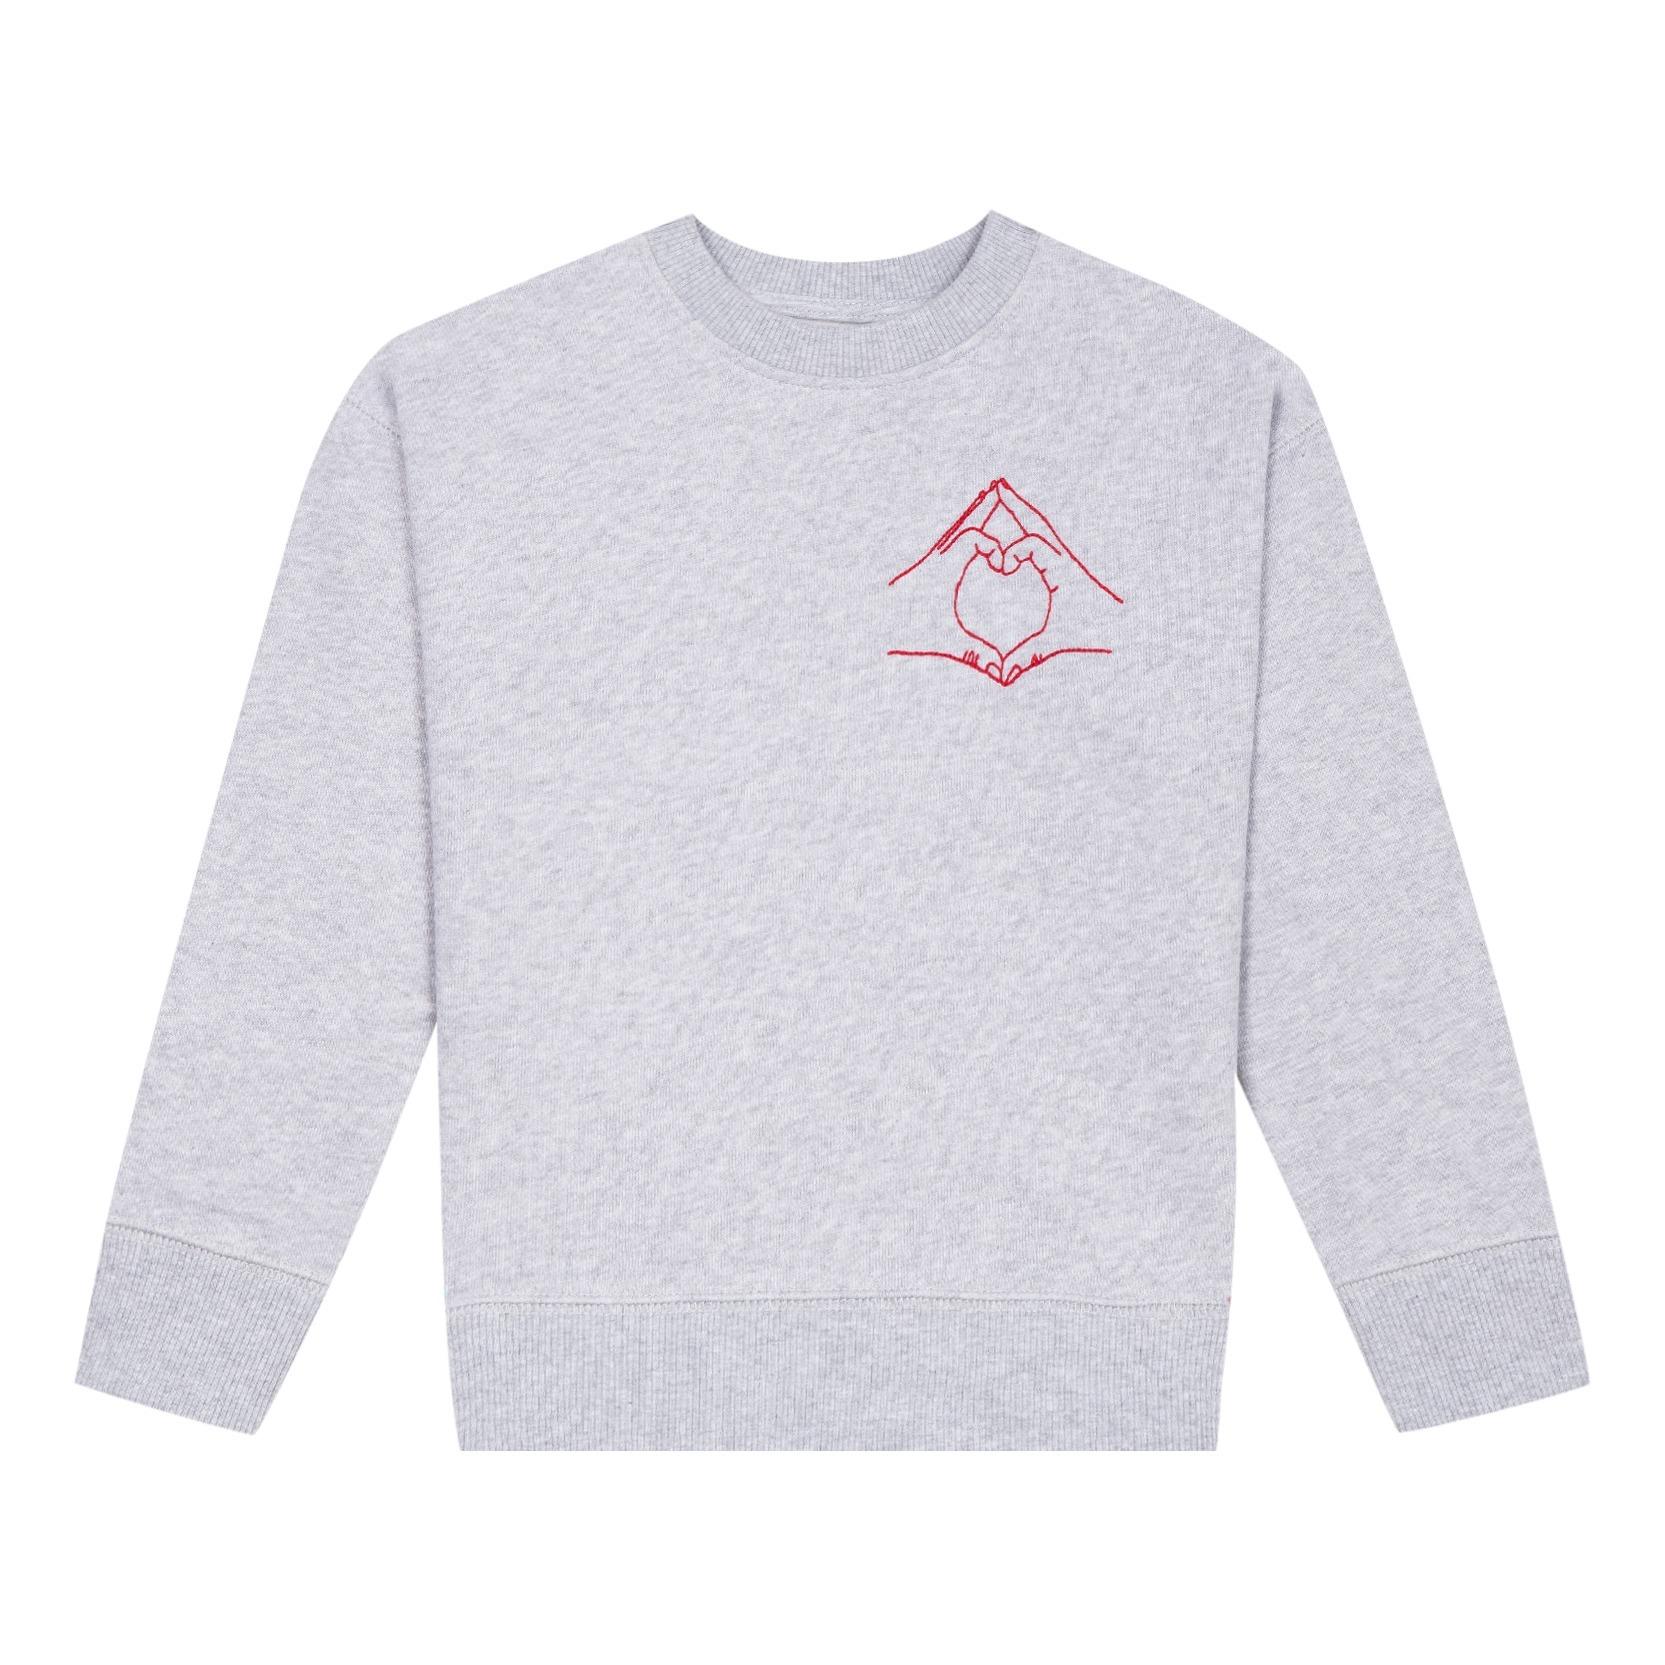 OK: Sweatshirt Hand Love